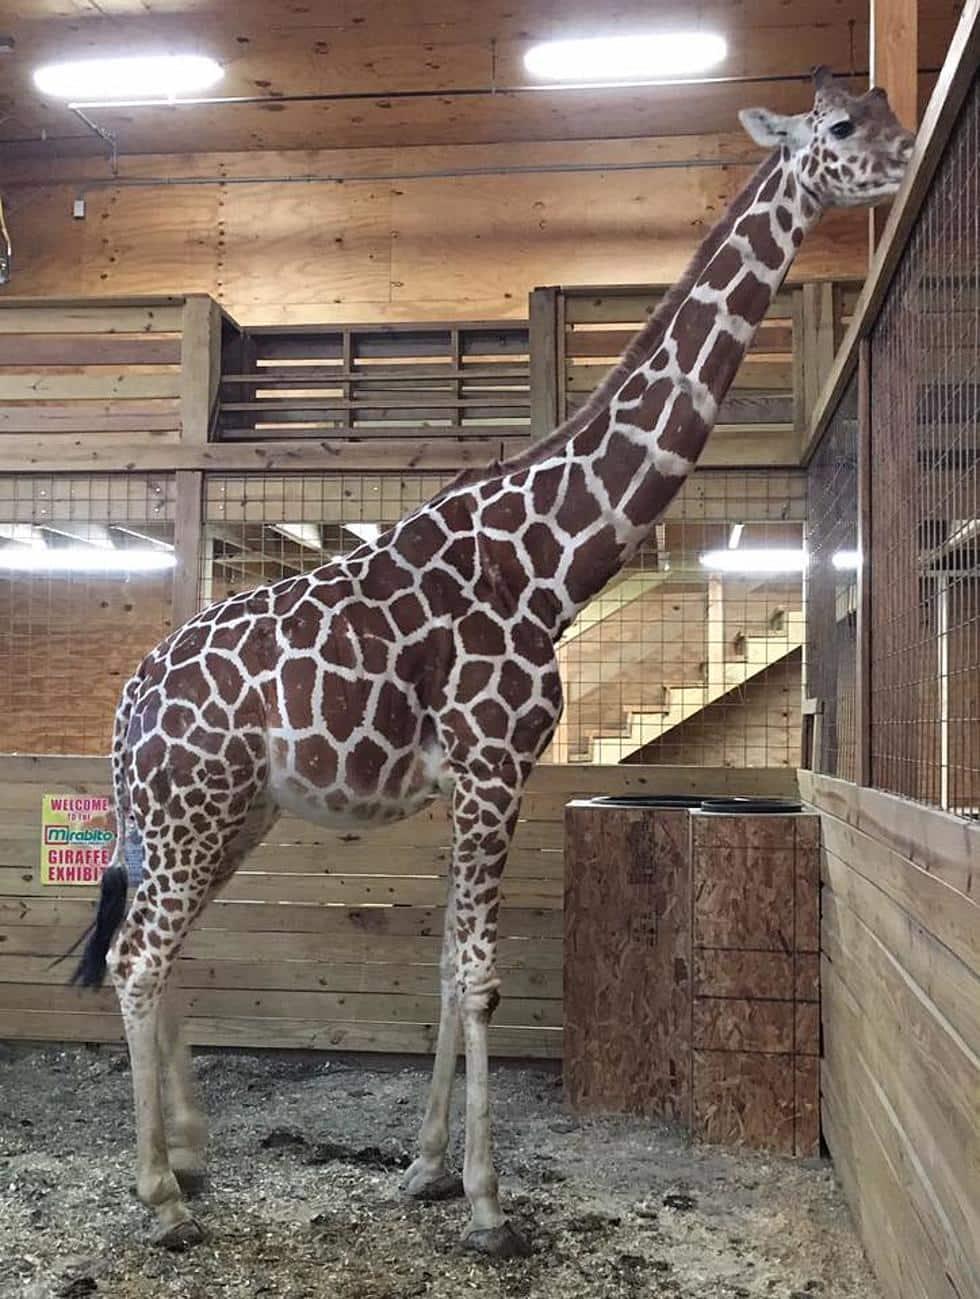 April: Giraffe Who Gave Birth in A Viral Livestream Dies Aged 20